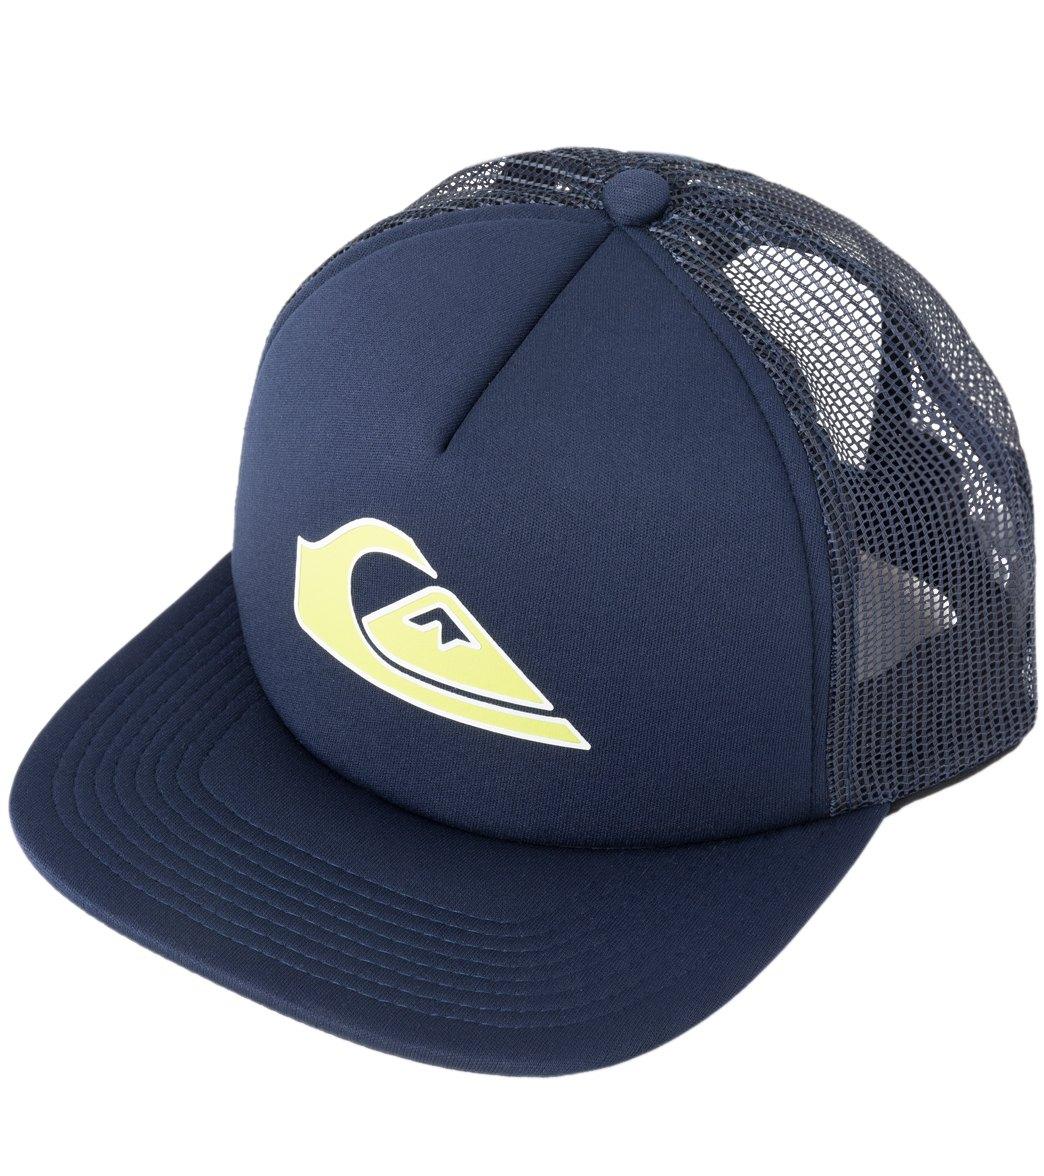 3768413406579 Quiksilver Men s Snapper Trucker Hat at SwimOutlet.com